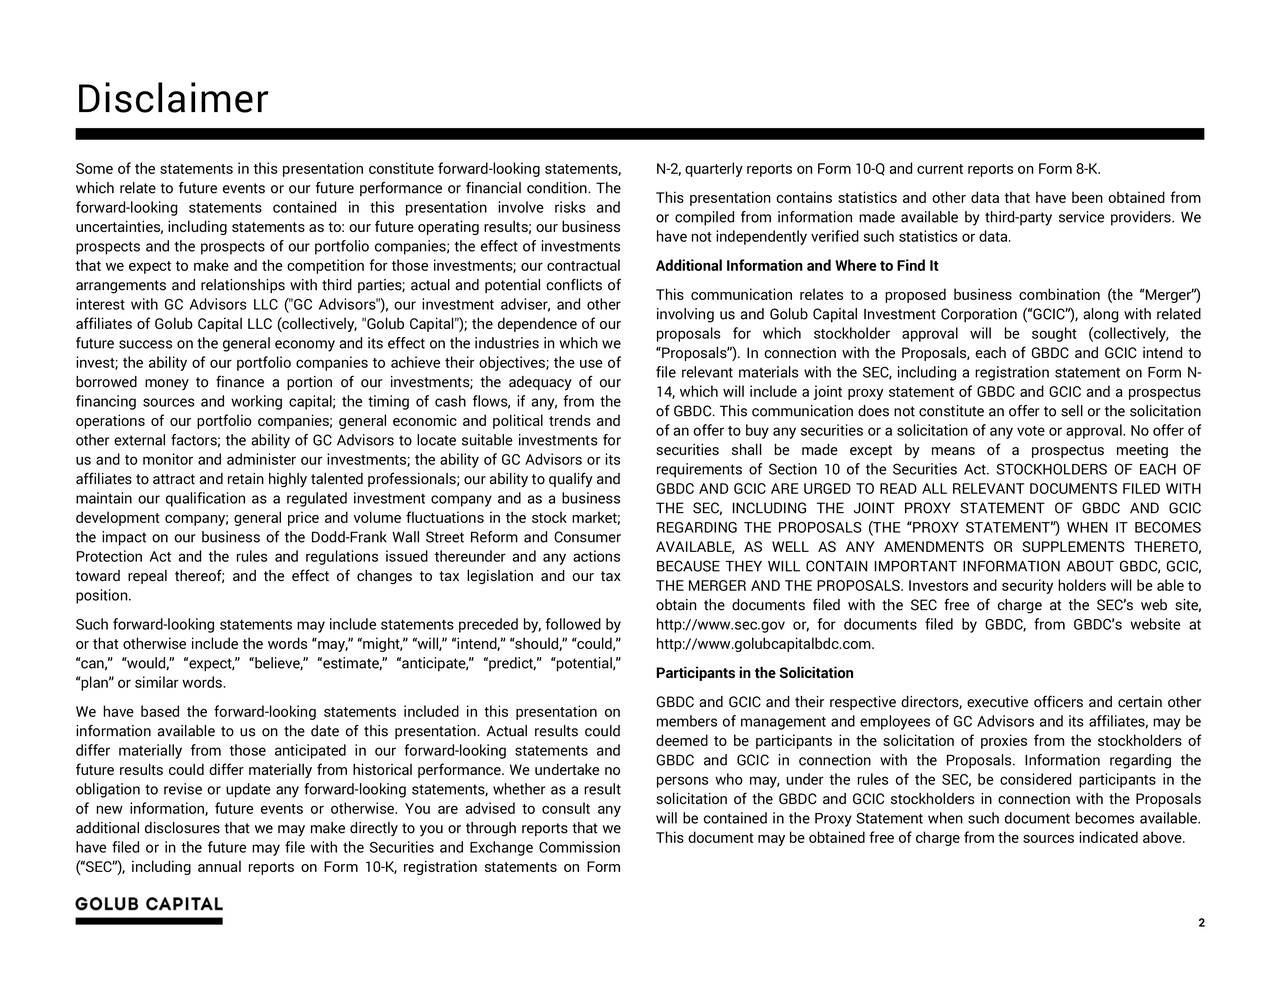 capital markets and key participants document